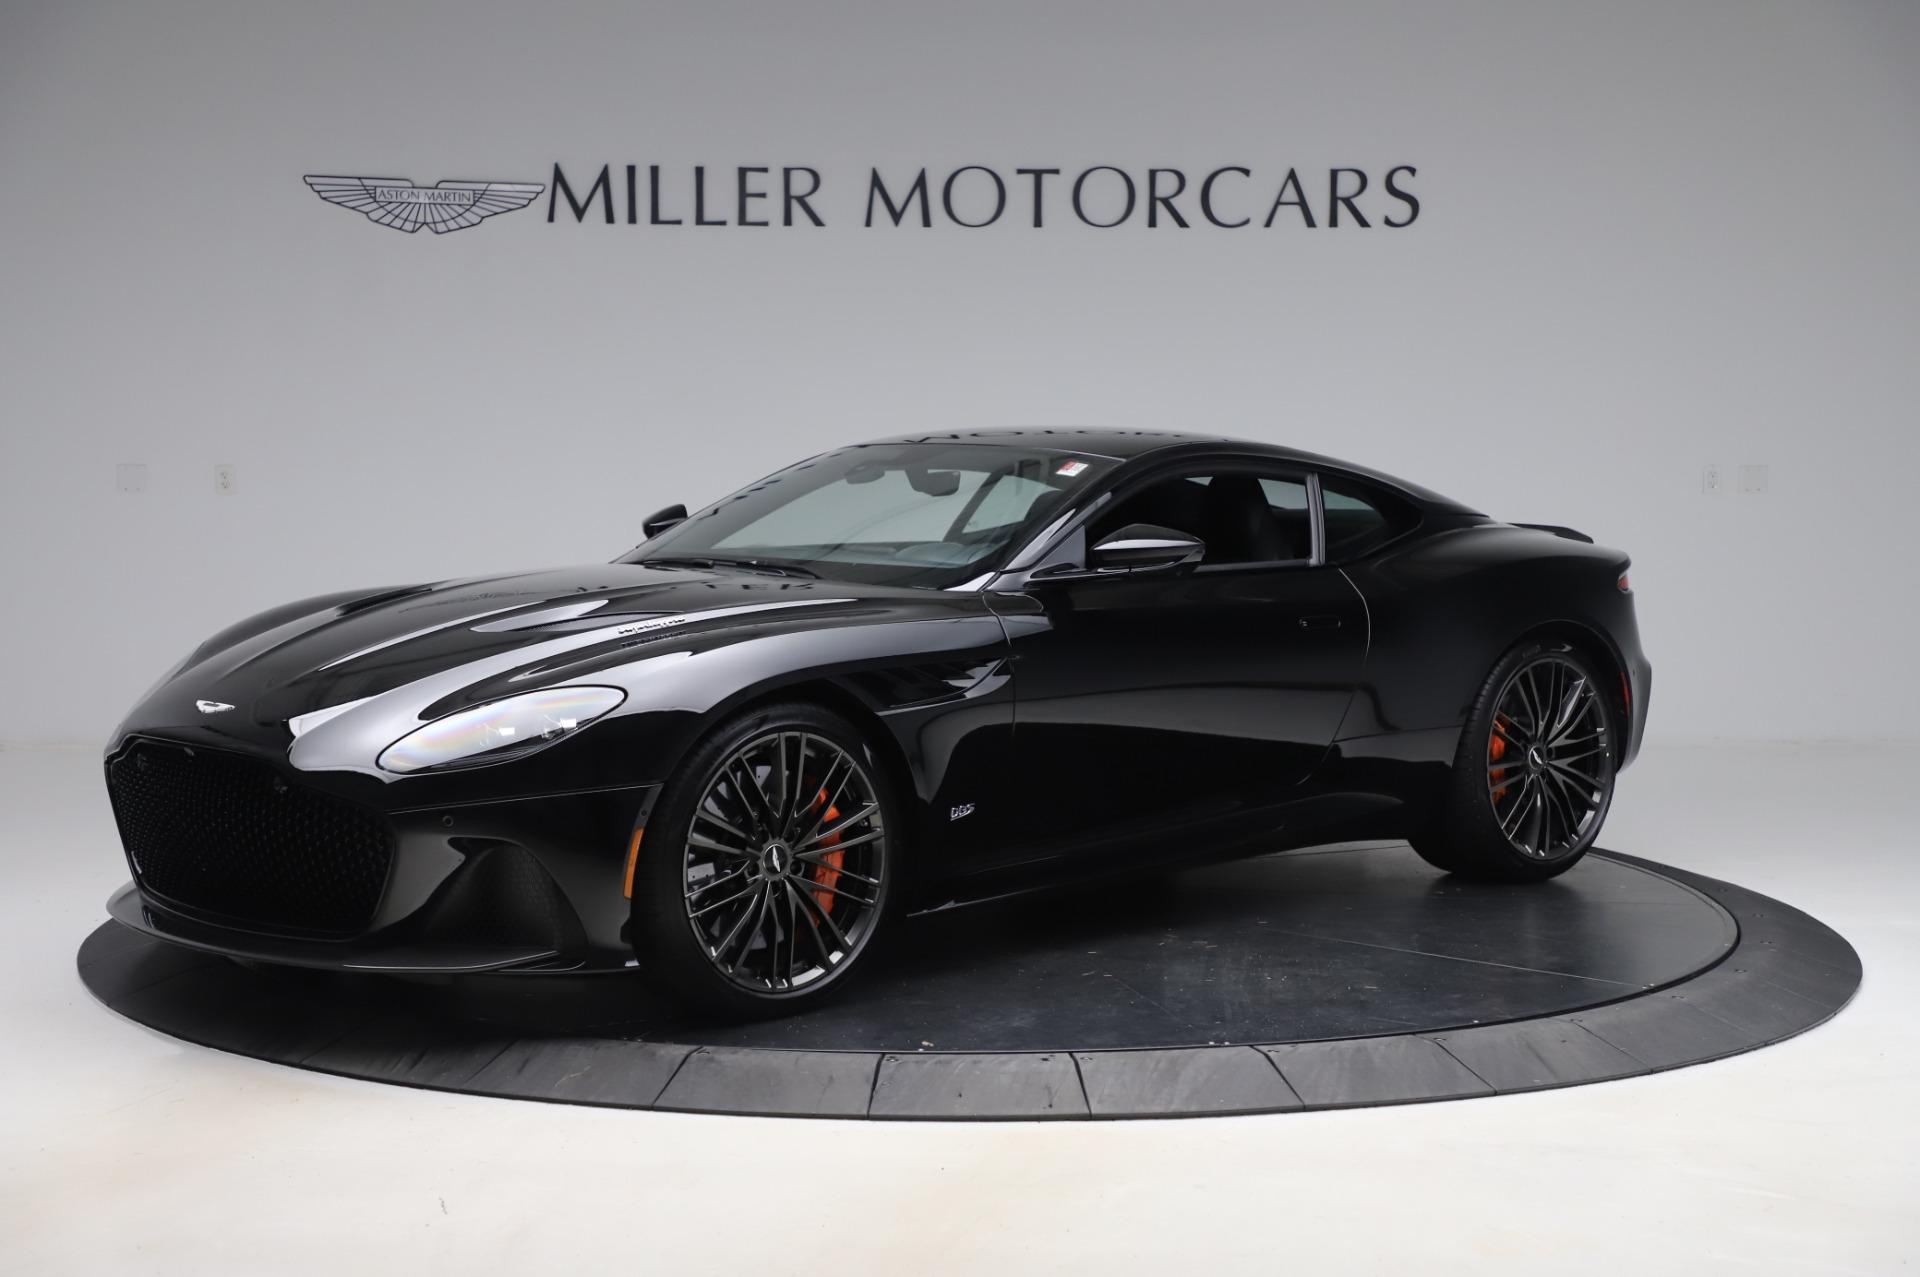 New 2020 Aston Martin DBS Superleggera Coupe for sale $328,786 at Maserati of Westport in Westport CT 06880 1